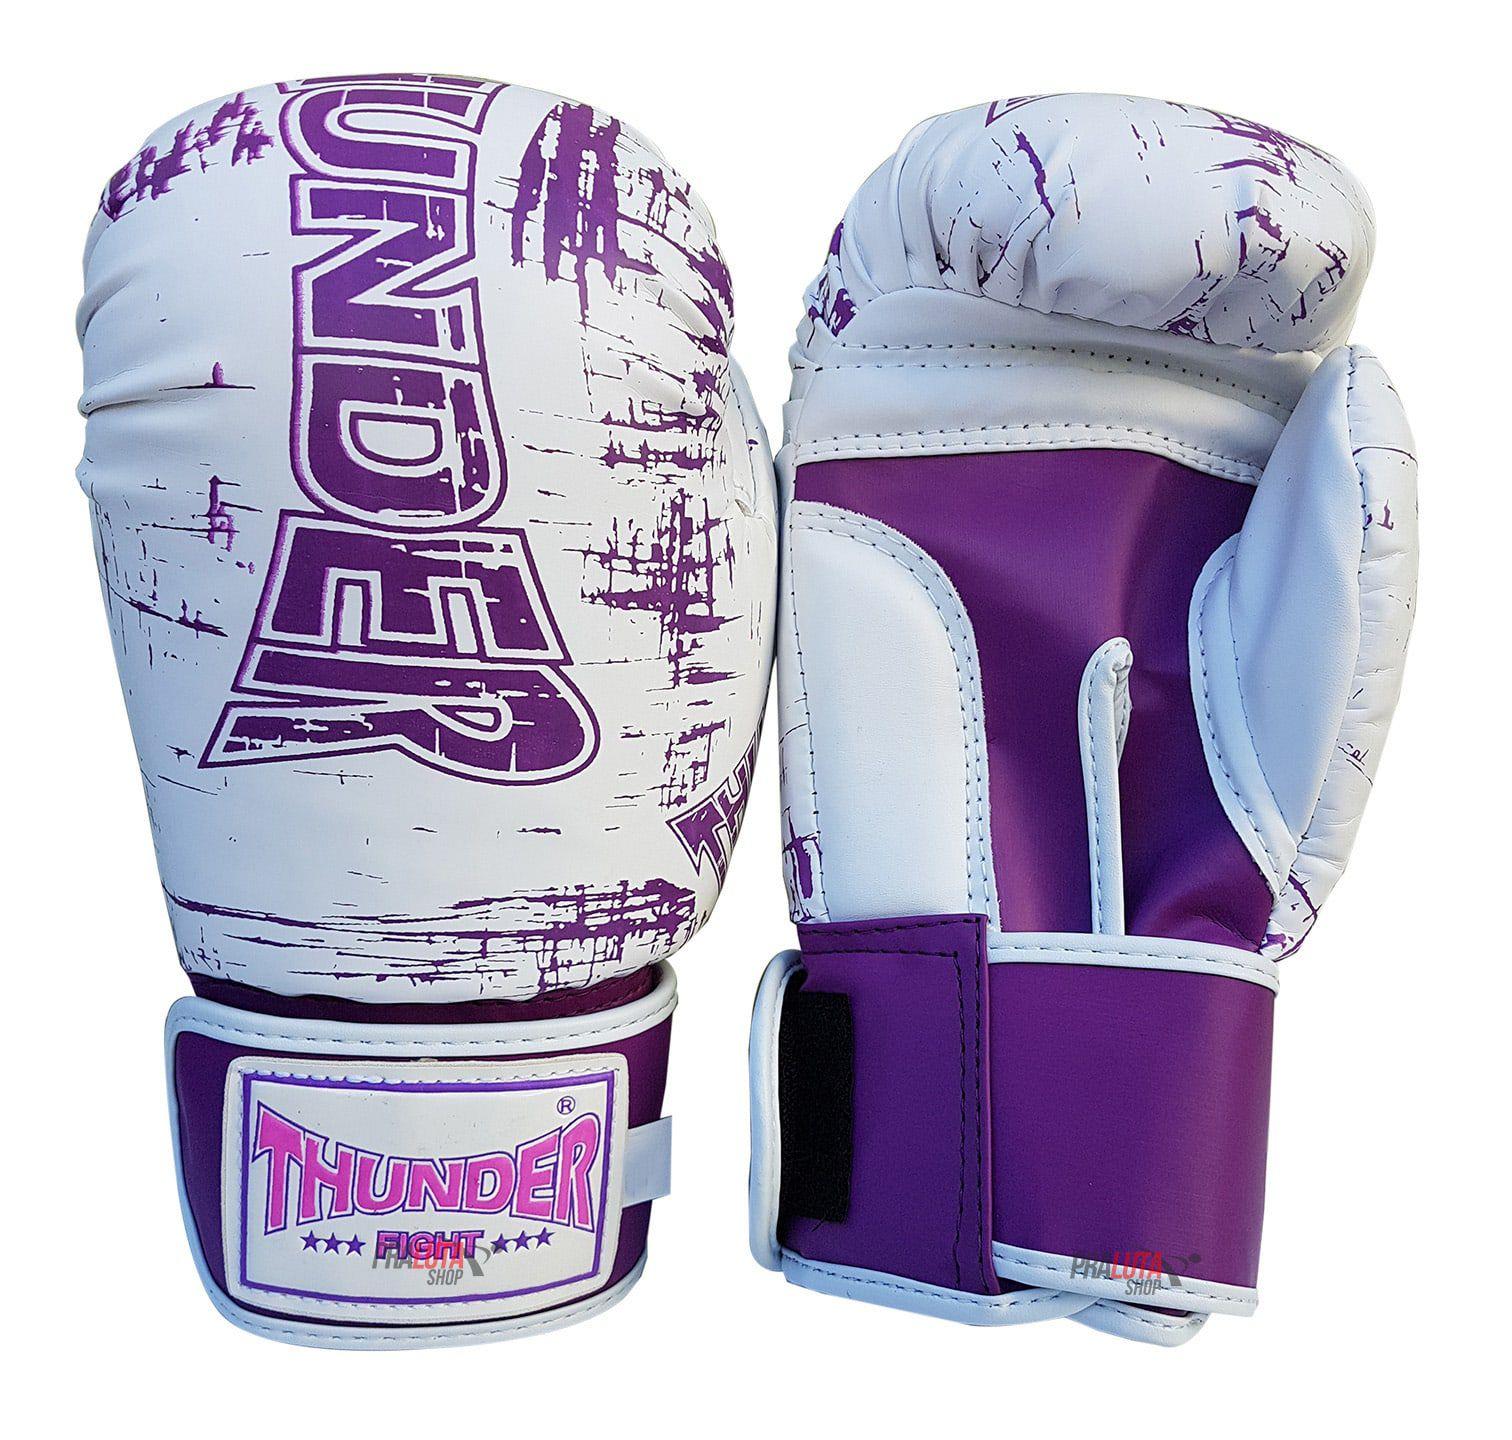 Kit de Muay Thai / Kickboxing Feminino 12oz - Branco Riscado Lilás - Thunder Fight  - PRALUTA SHOP